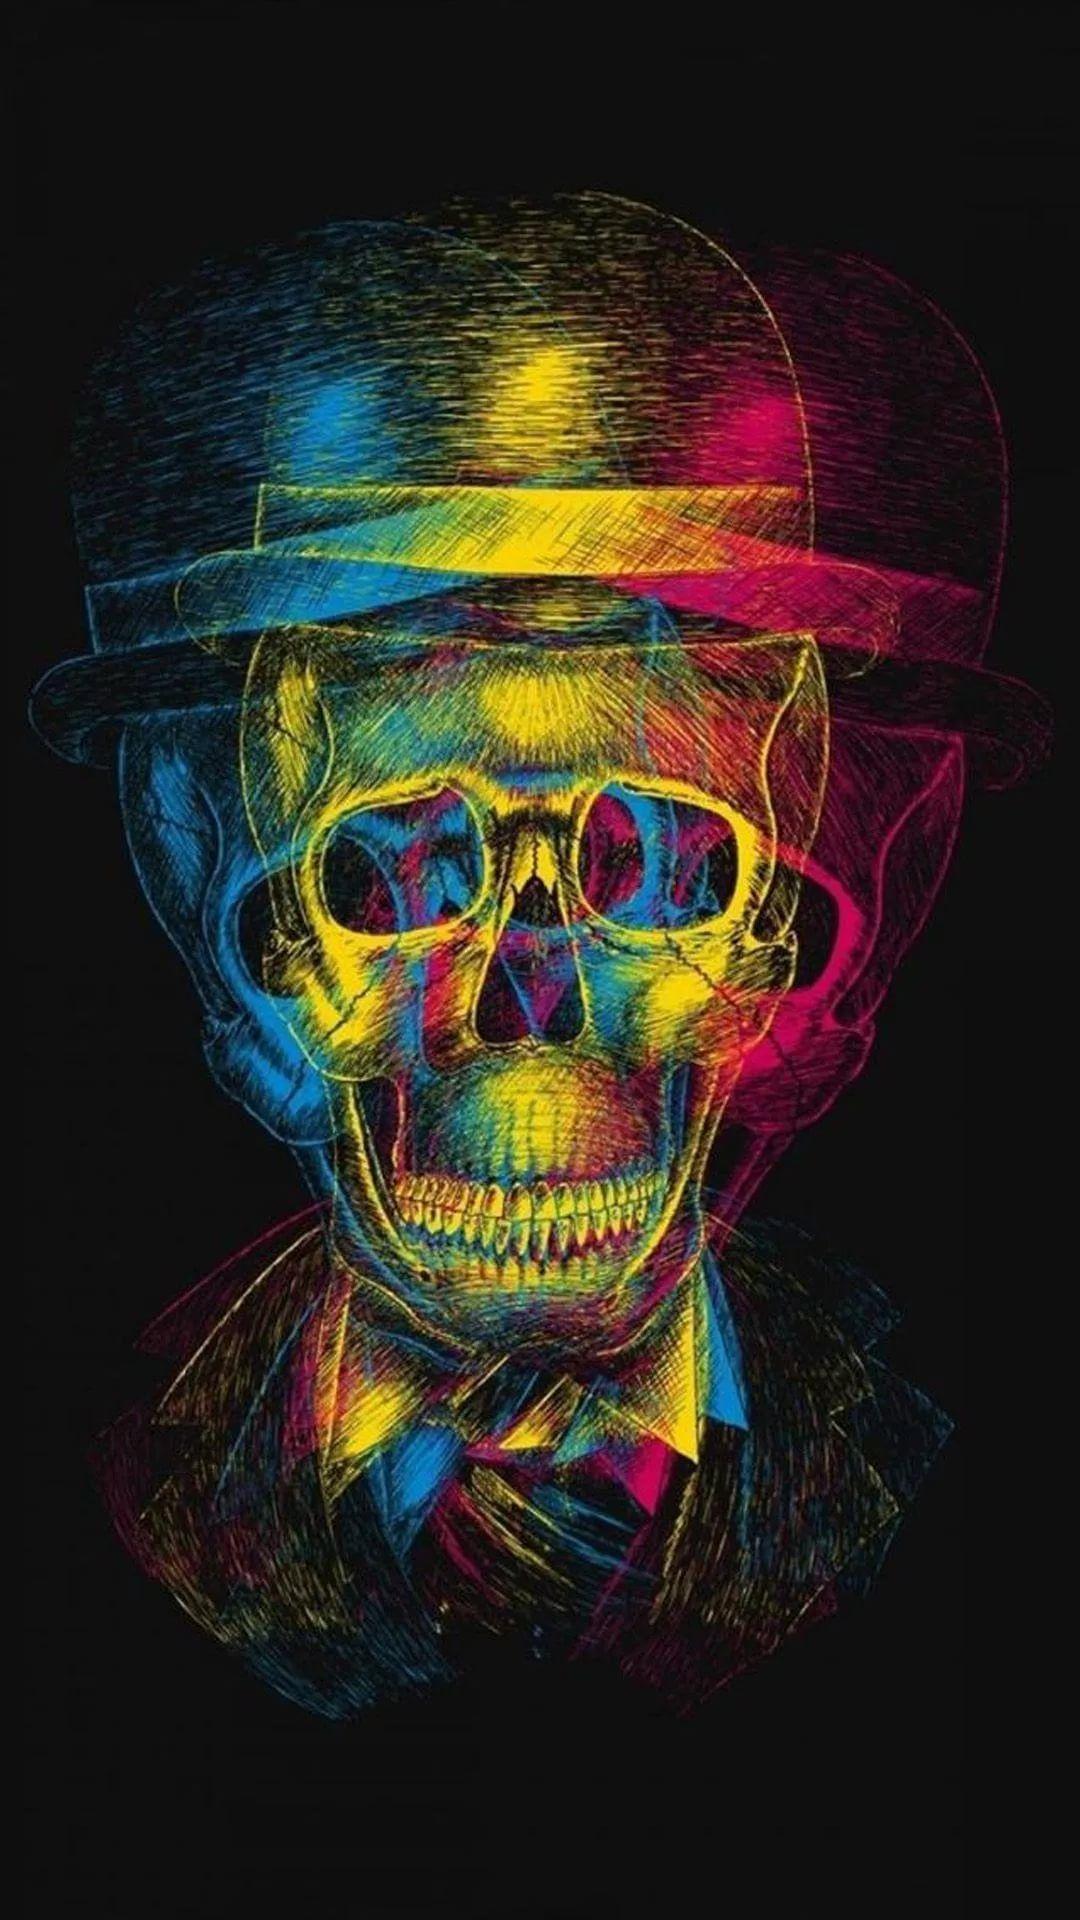 Cool Skull iPhone x wallpaper